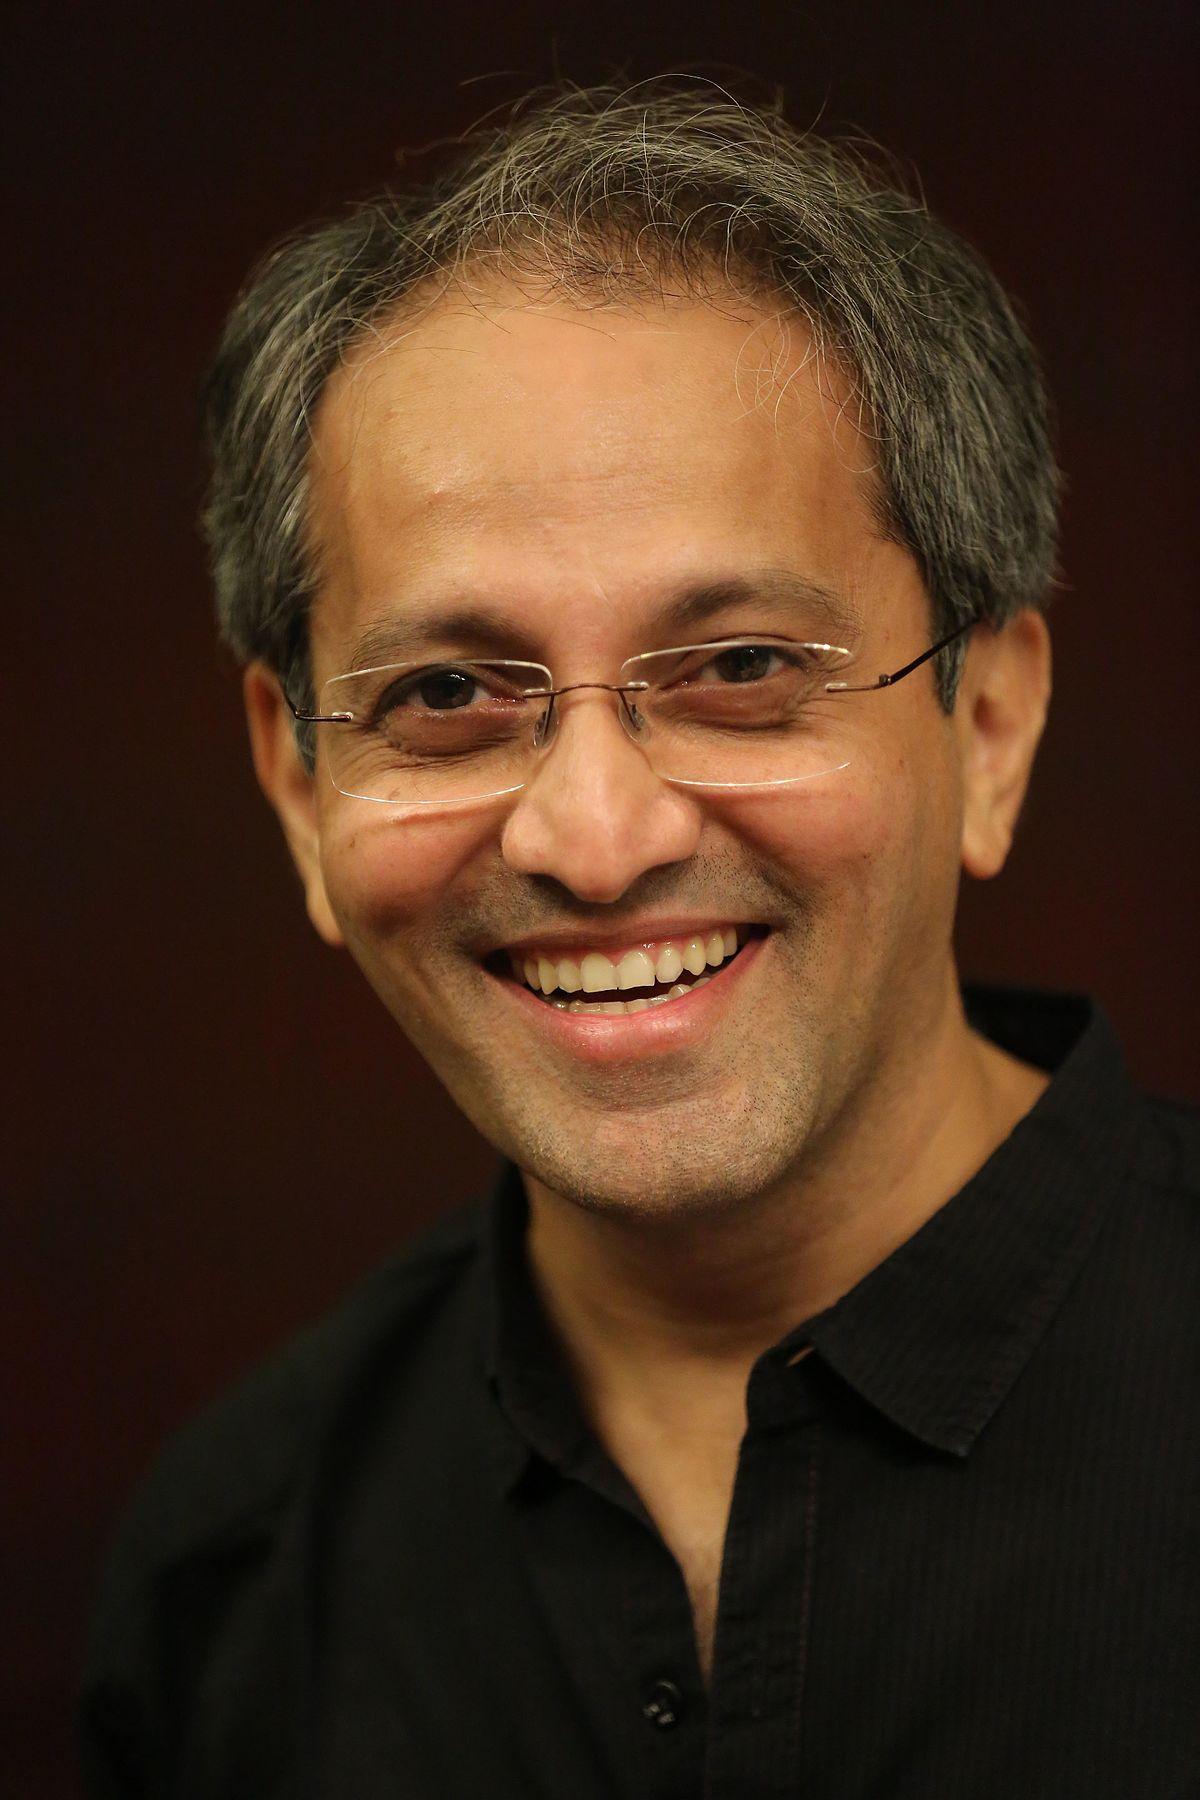 Rajesh Mapuskar Wikipedia